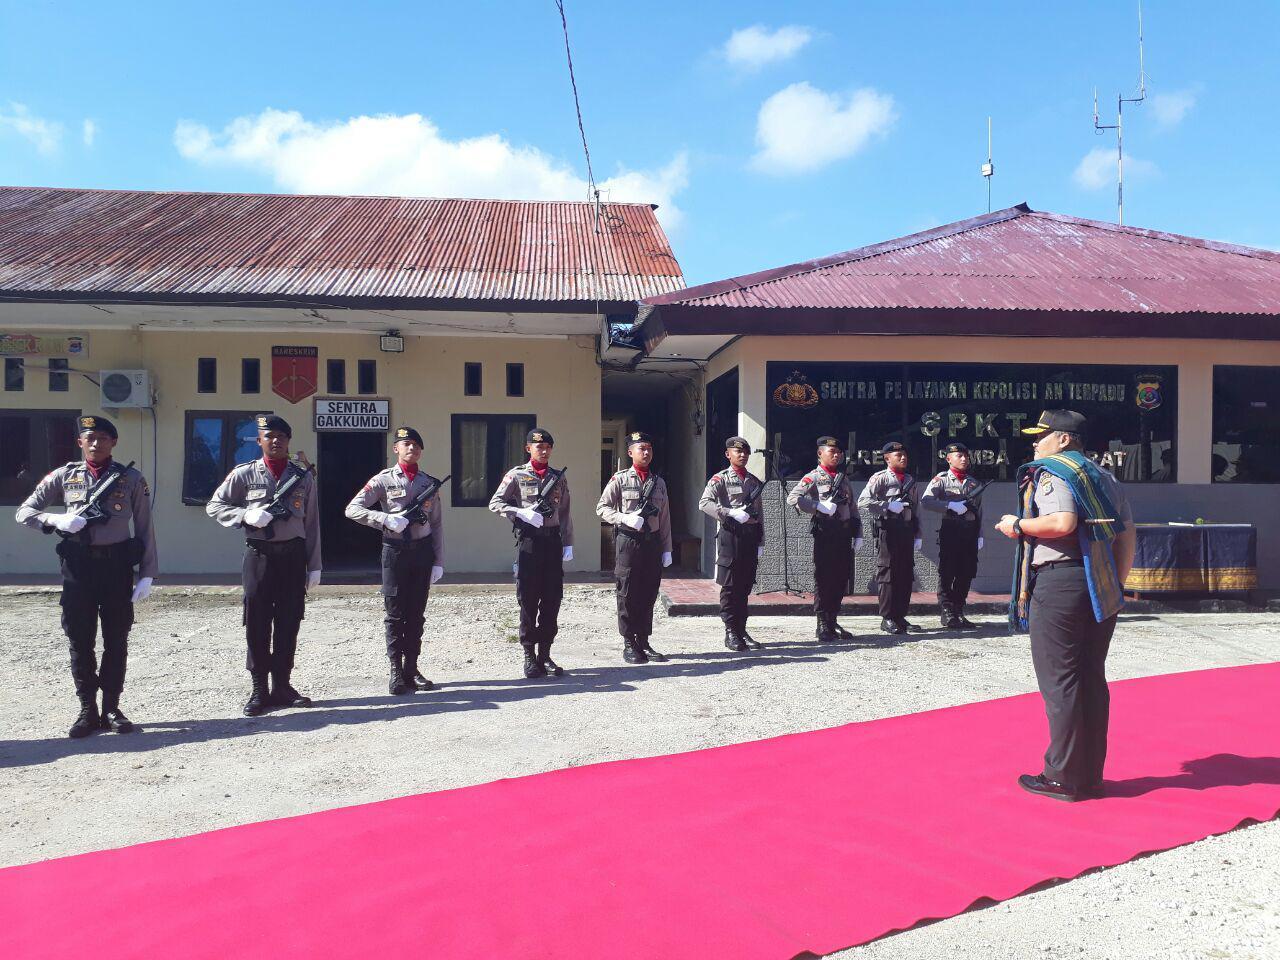 Jajaran Polres Sumba Barat dipimpin AKBP Muhamad Erwin Sambut Kunjungan Kapolda NTT Brigjen Pol Drs. Agung Sabar Santoso, SH, MH